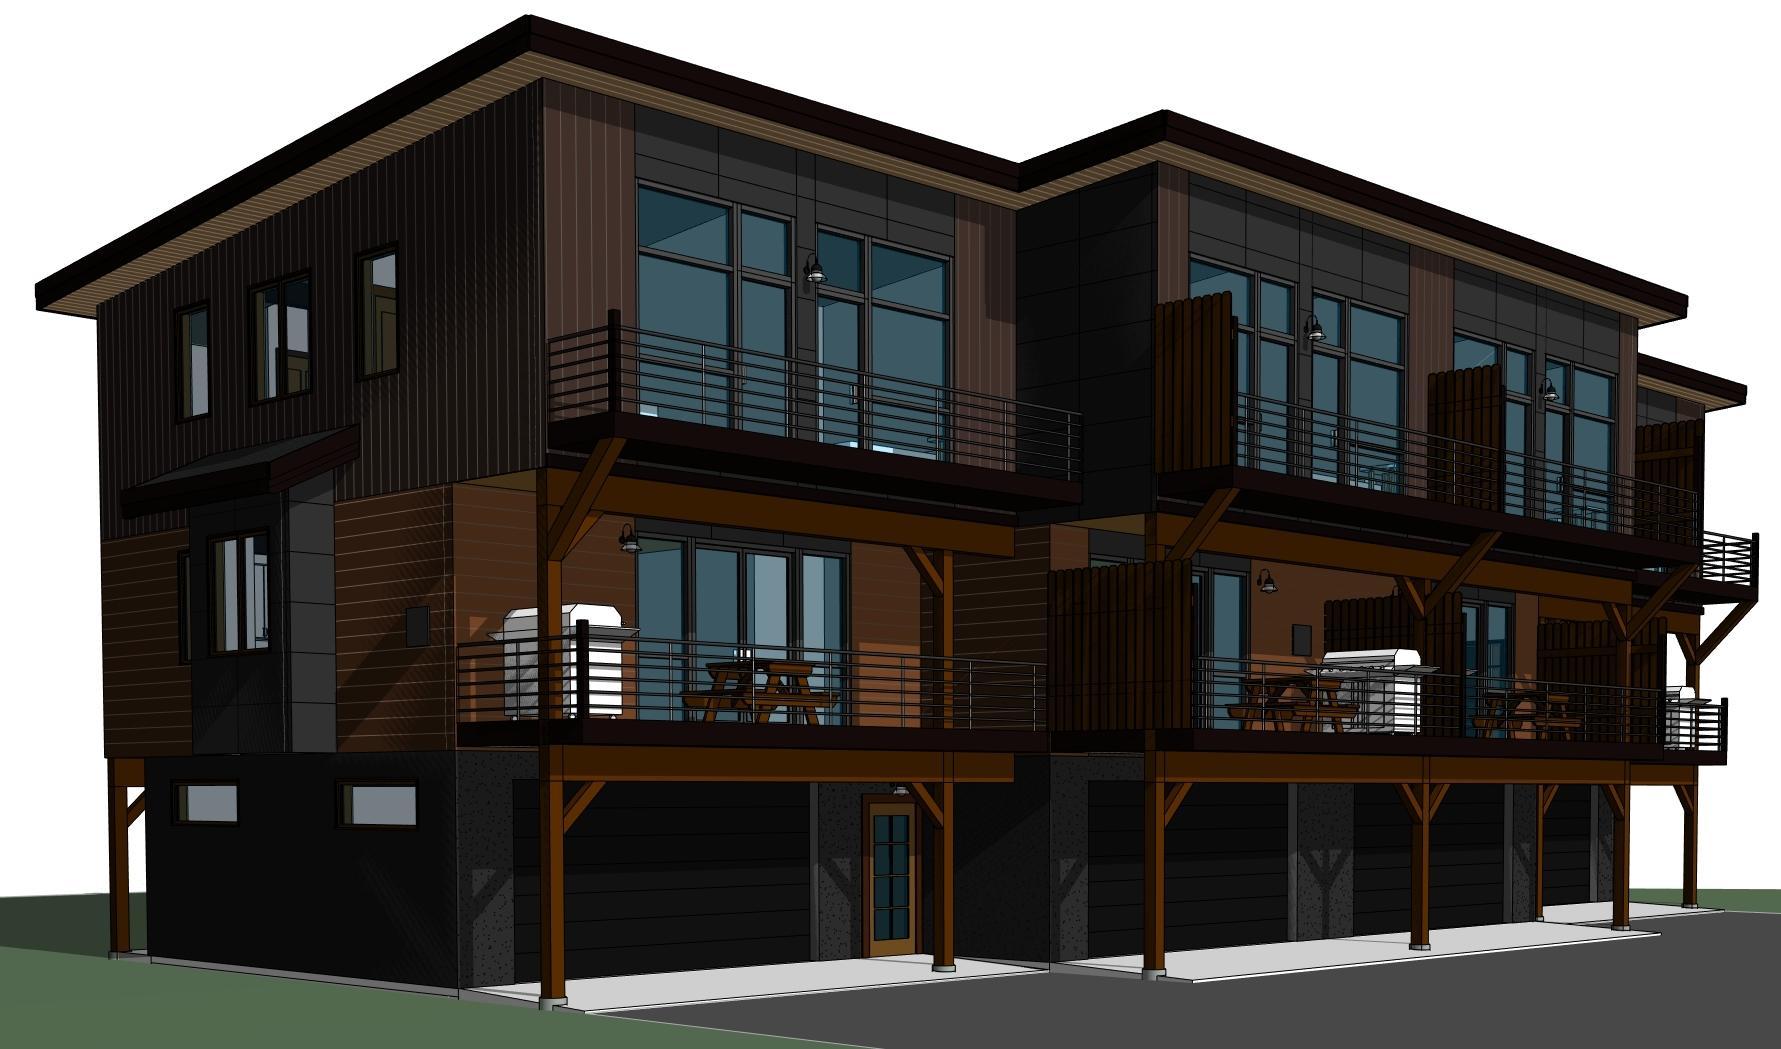 114 Karrow Avenue, Unit C, Whitefish, MT 59937